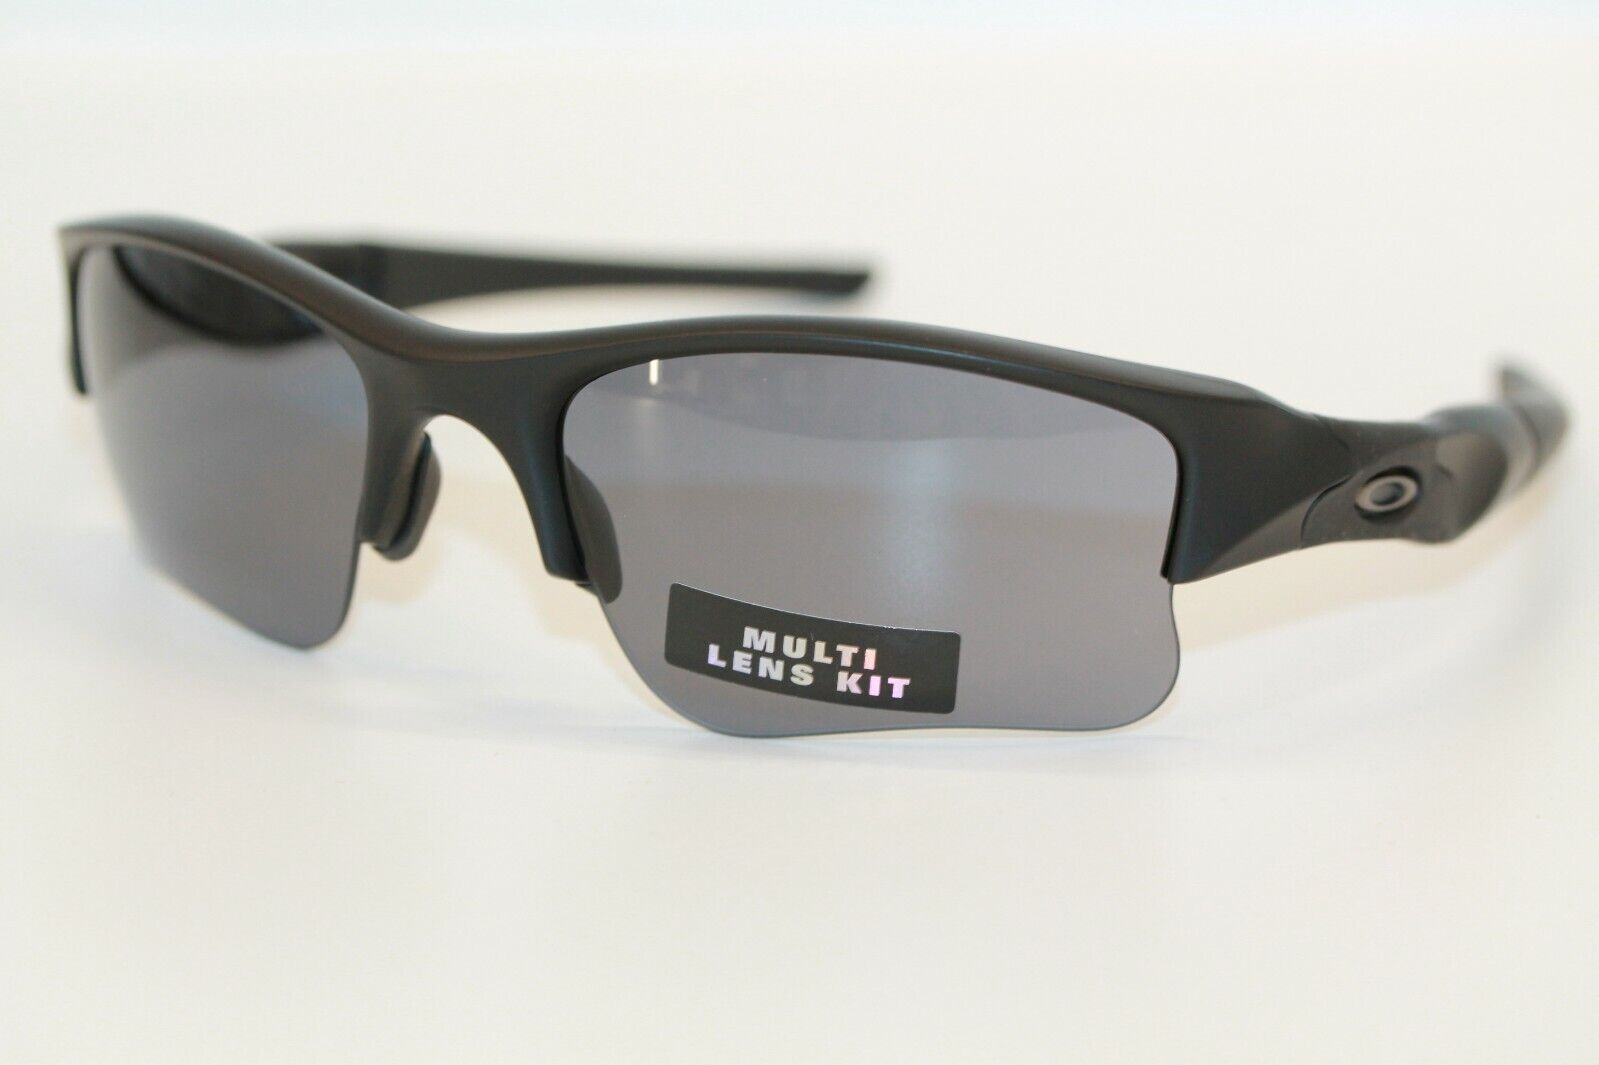 oakley-si-flak-jacket-xlj-sunglasses-11-004-matte-black-frame-w-grey-lens